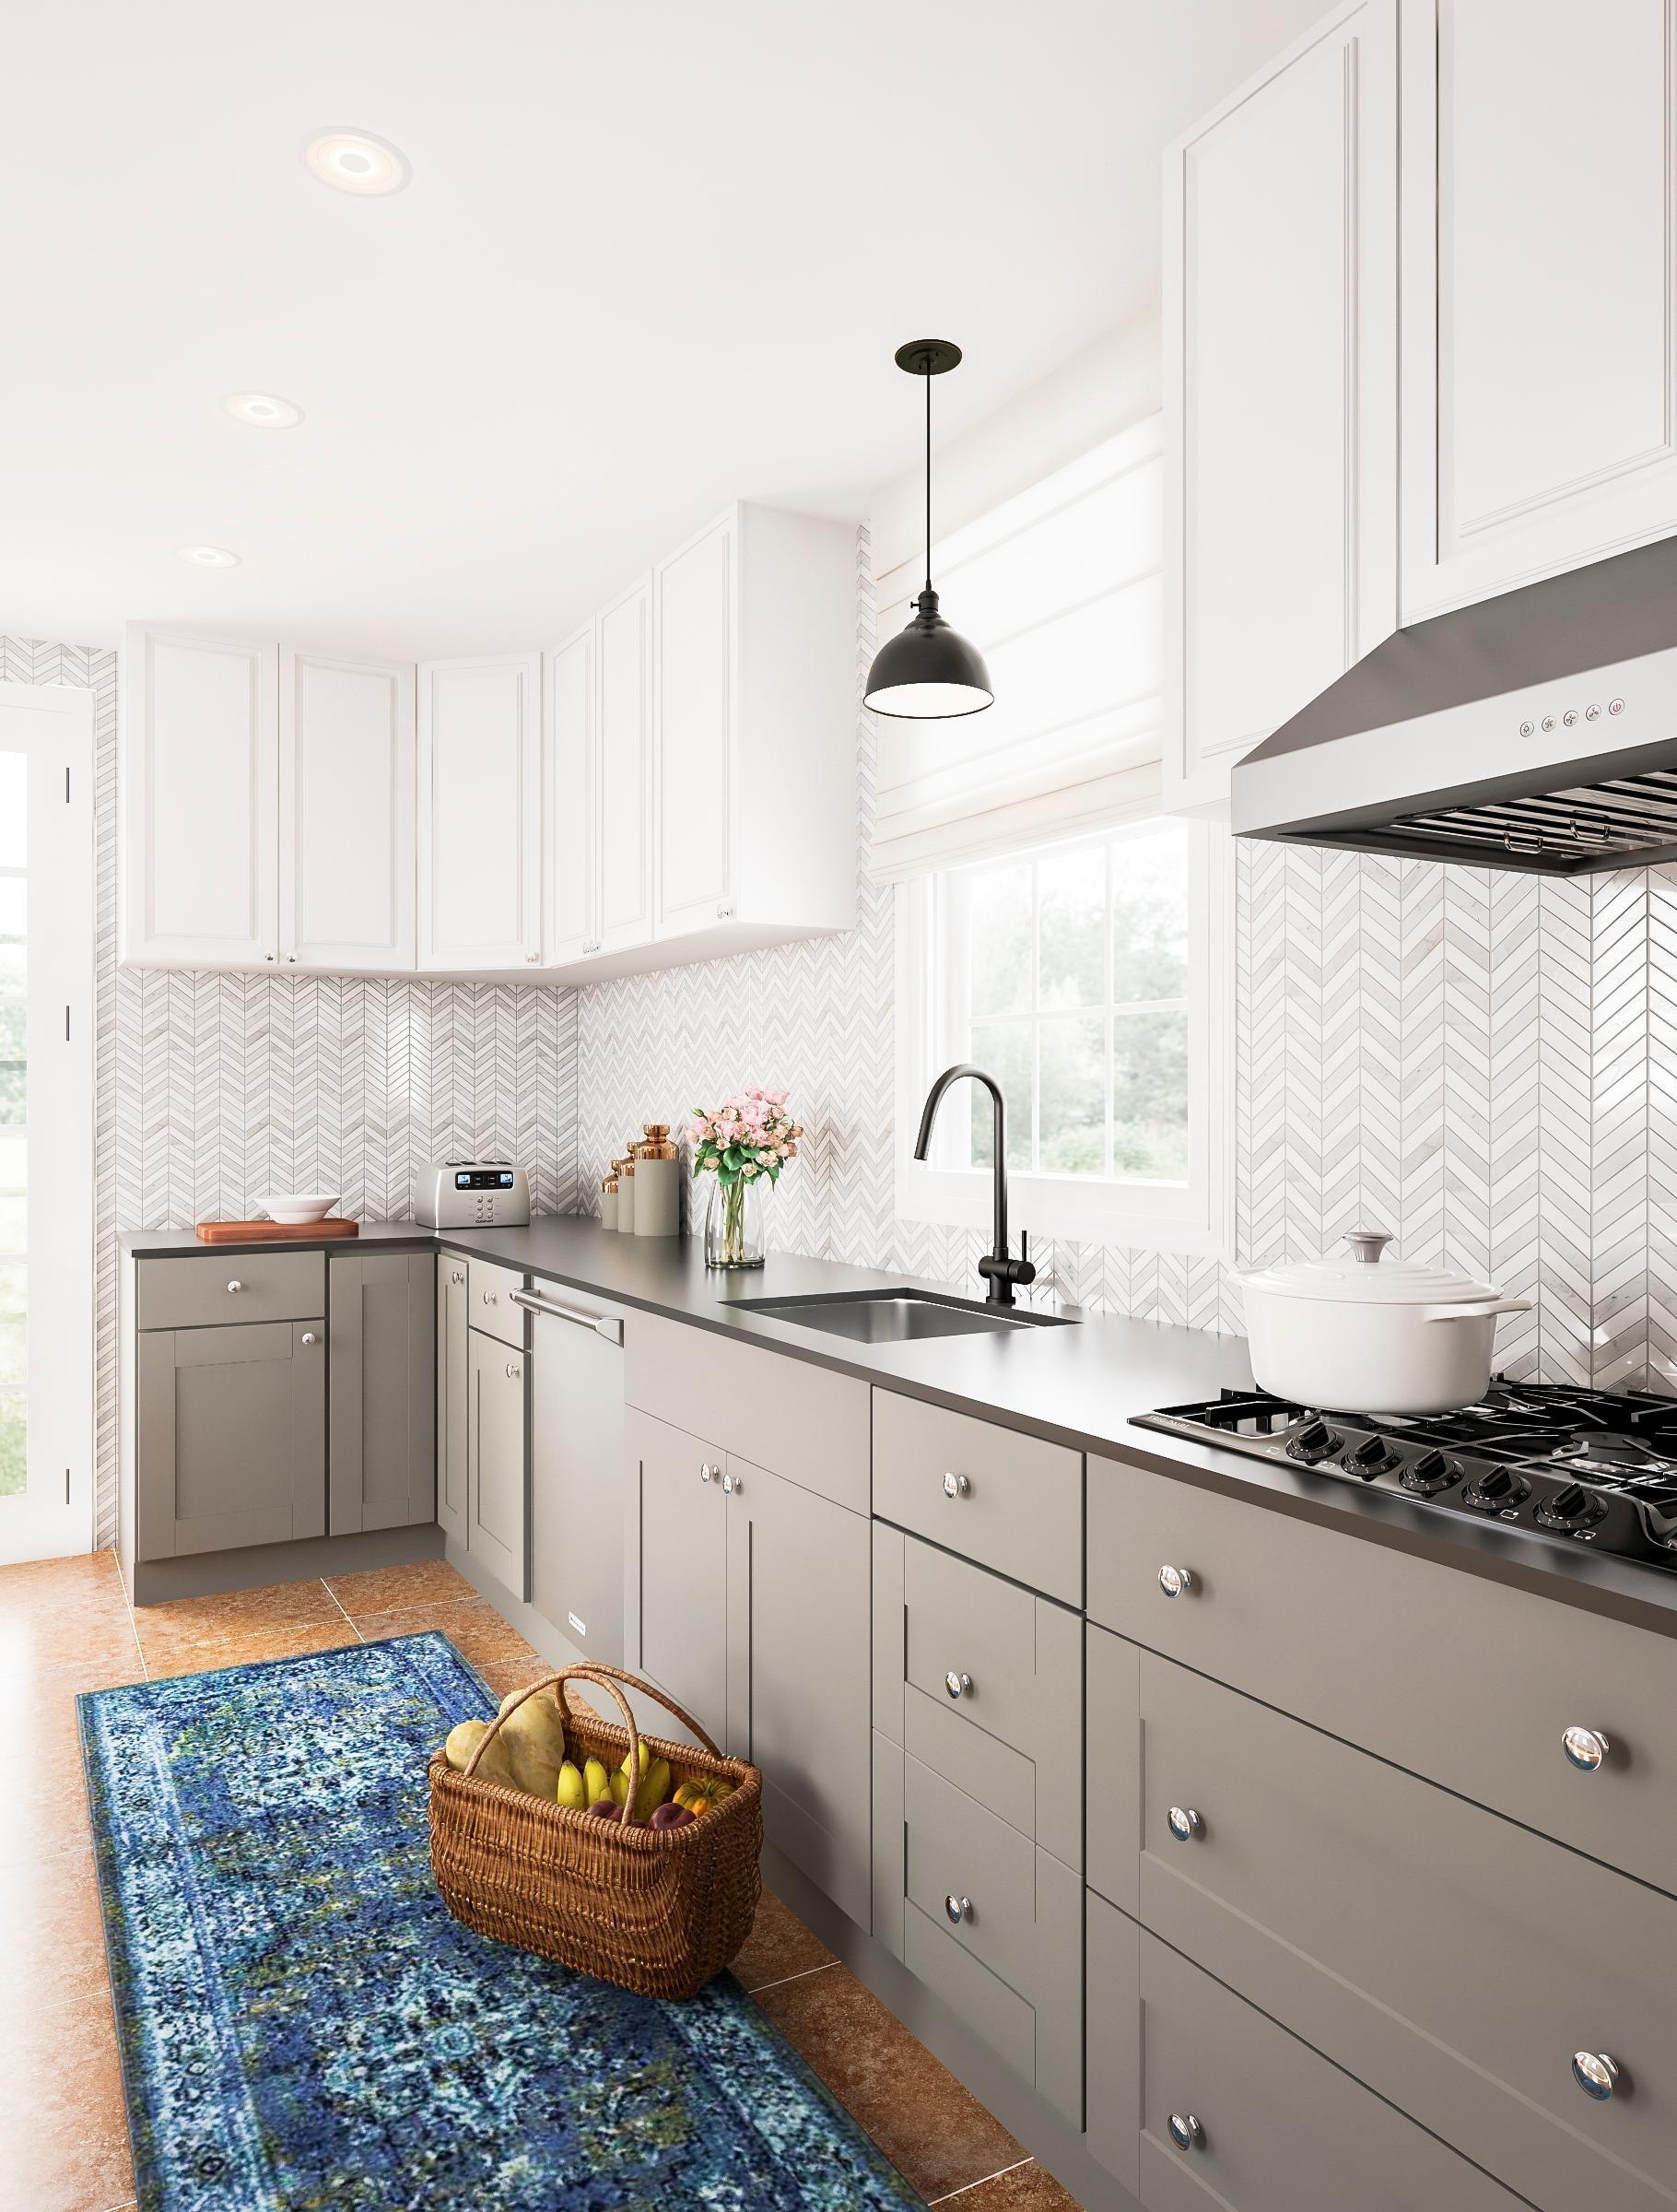 19 Impressive Beadboard Backsplash Diy Ideas Kitchen Cabinet